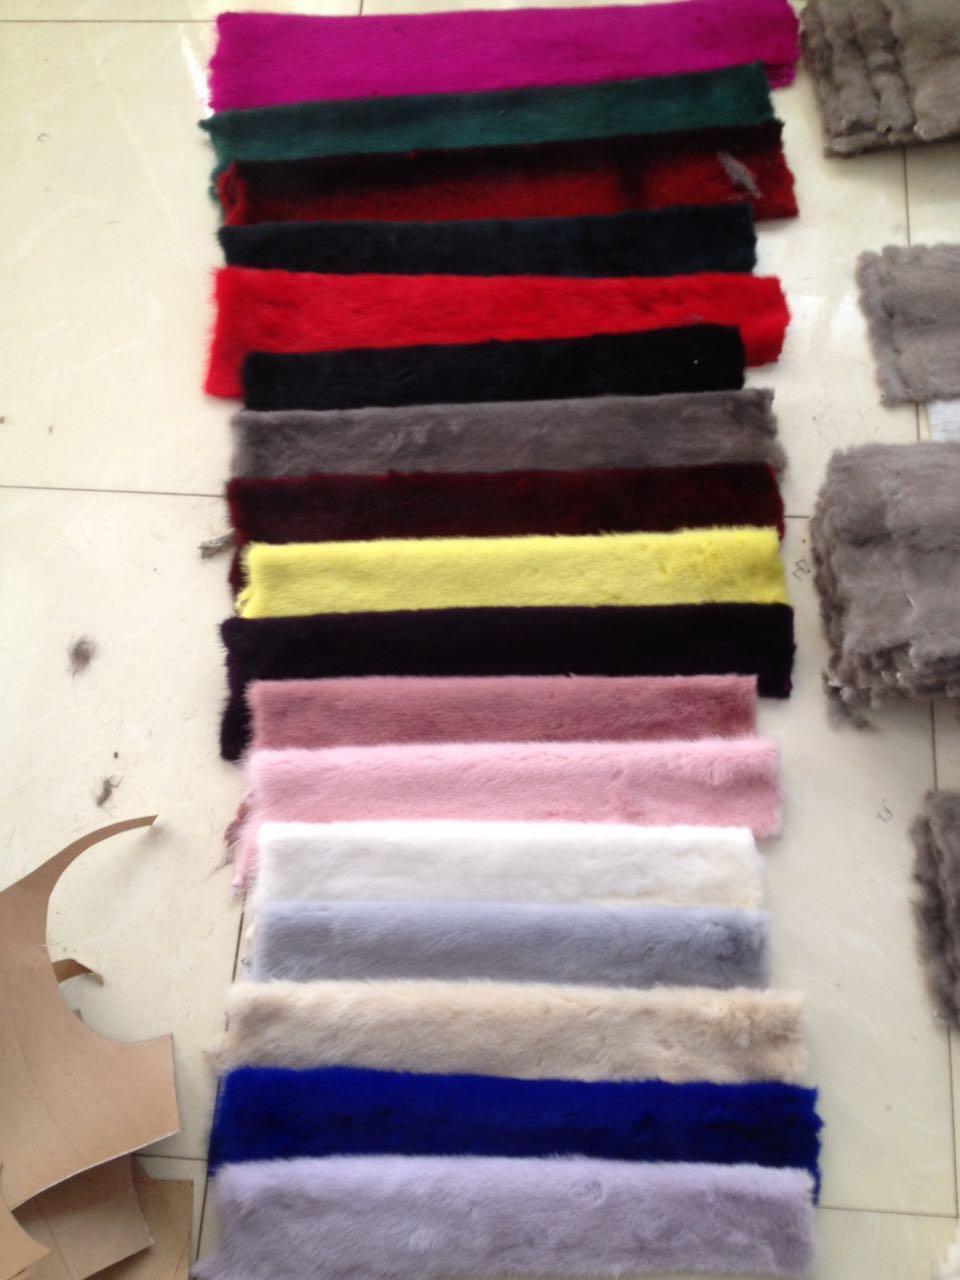 21ba885f0 Soft Fur slide outdoor Casual Flat Slip On Fluffy Fur Slippers Sliders  sandals Mink Fox Raccoon